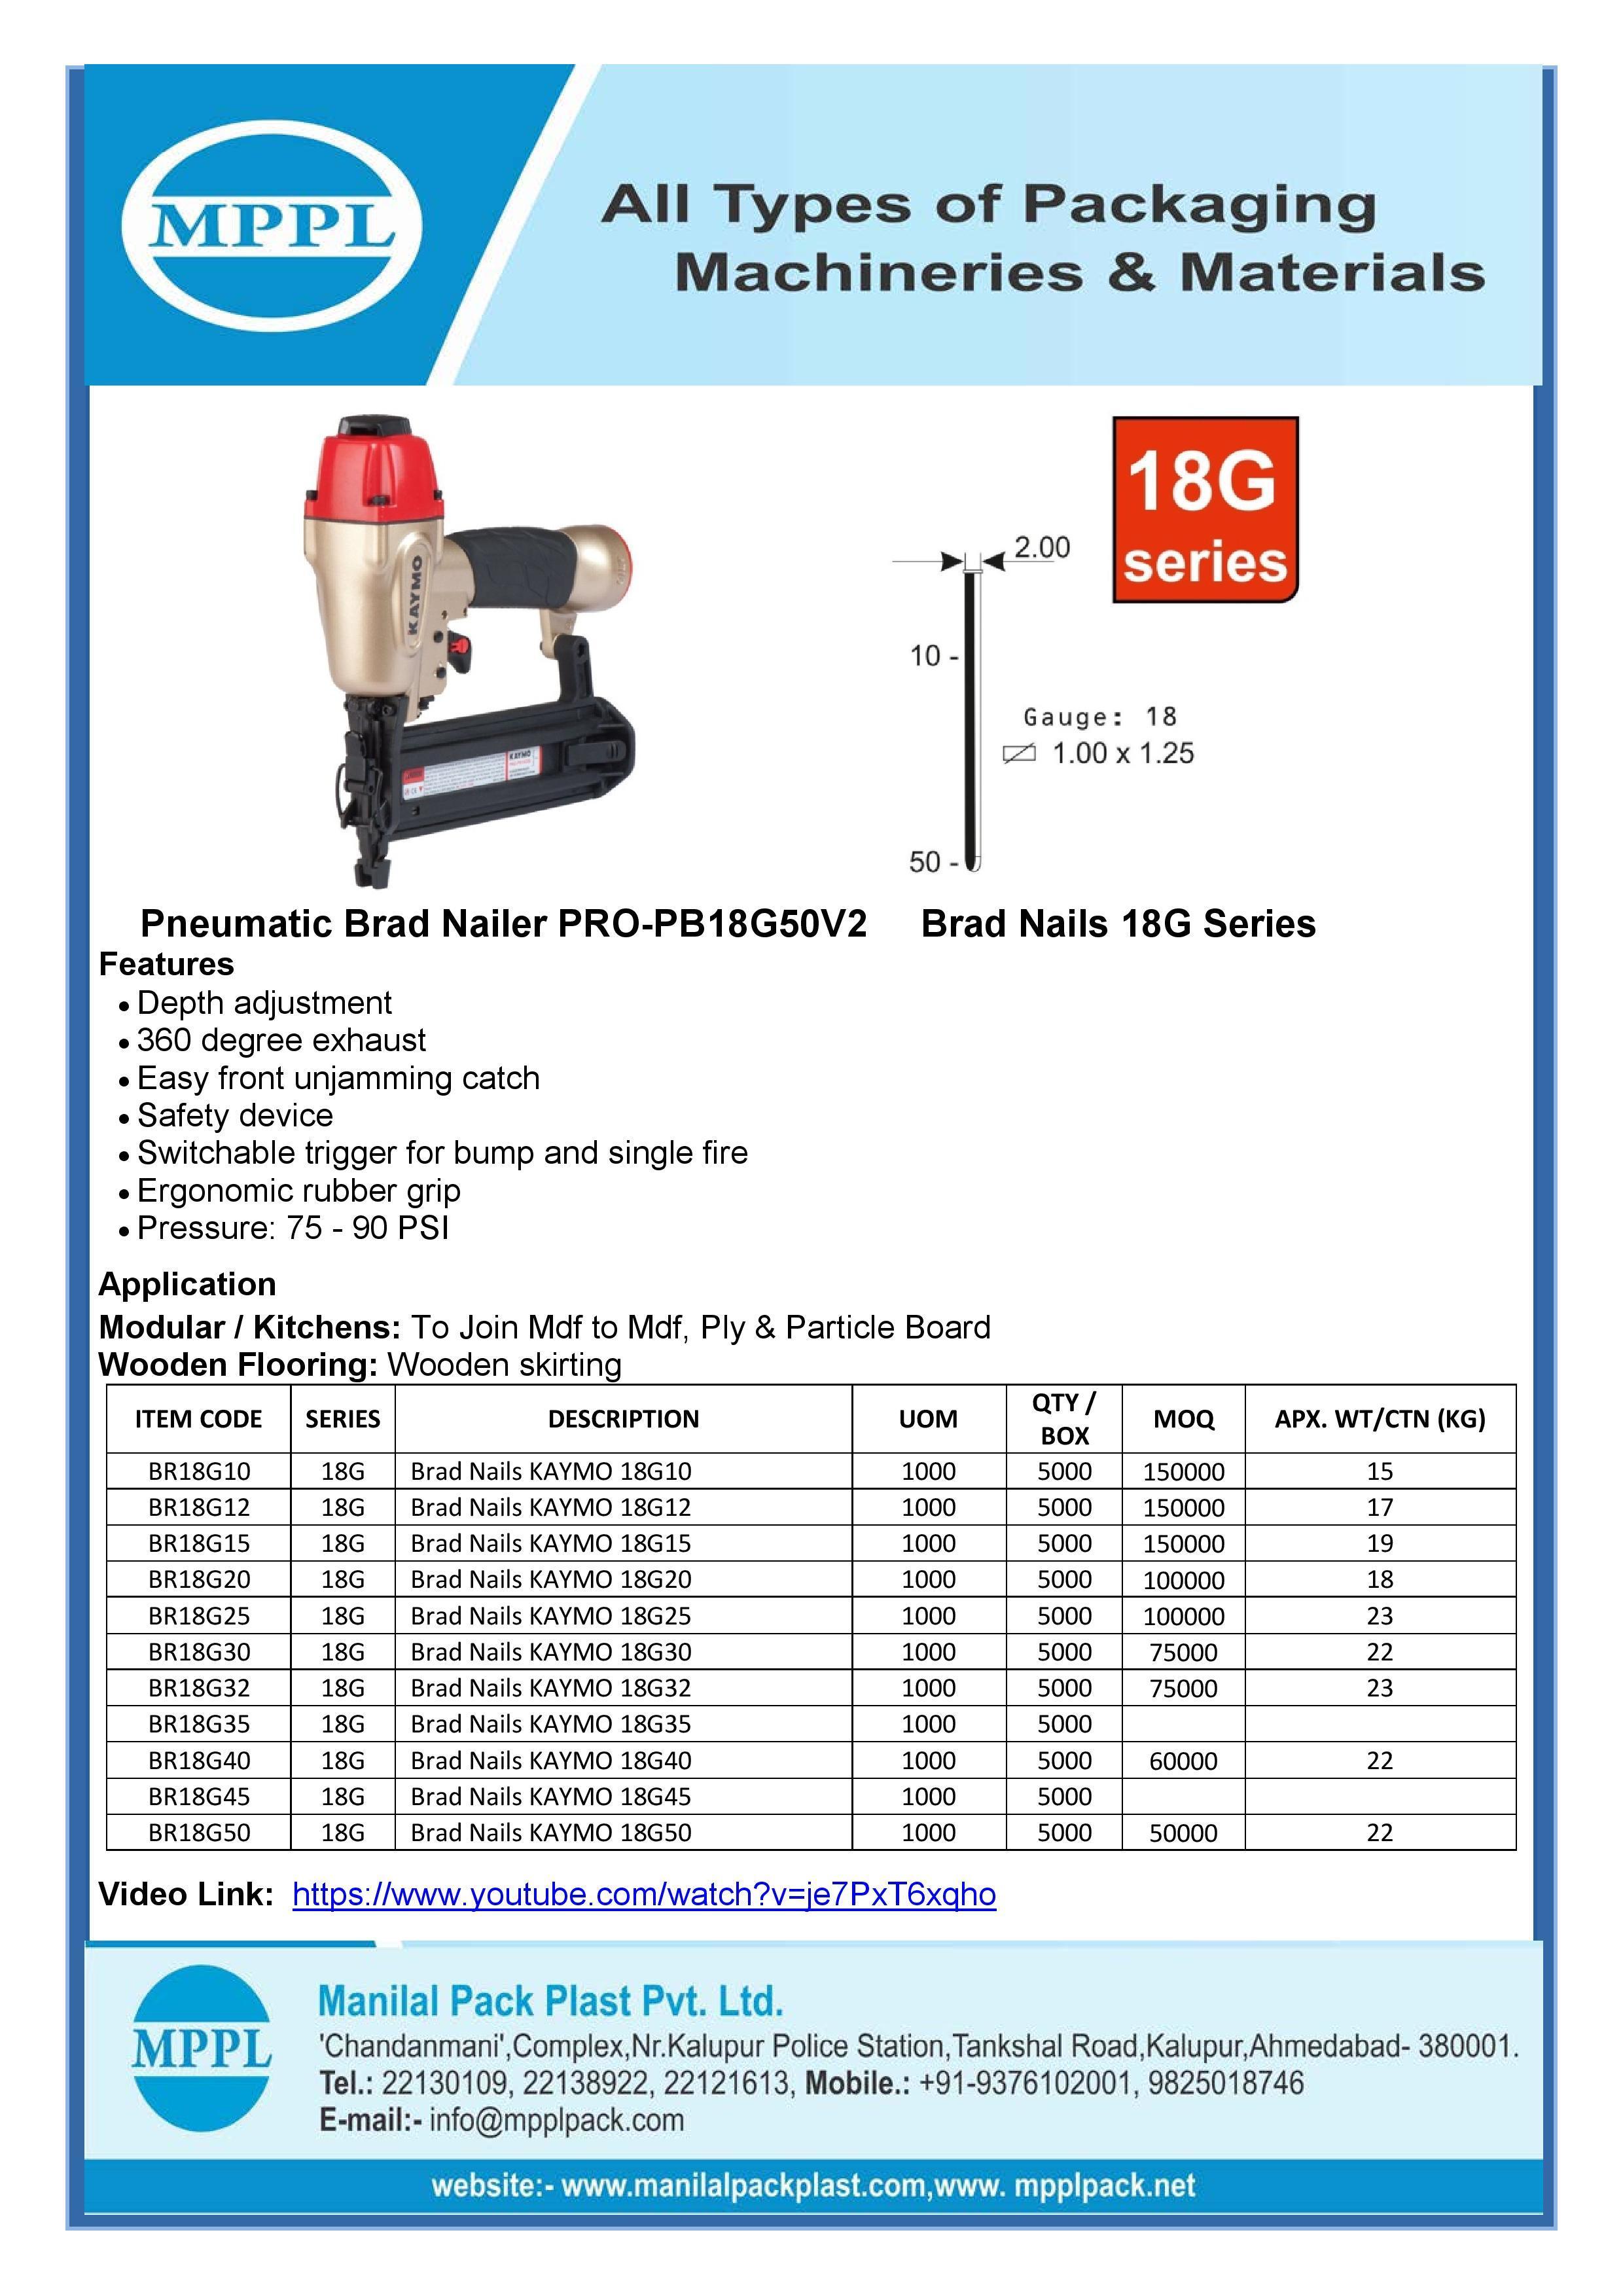 Pneumatic Brad Nailer PRO-PB18G50V2